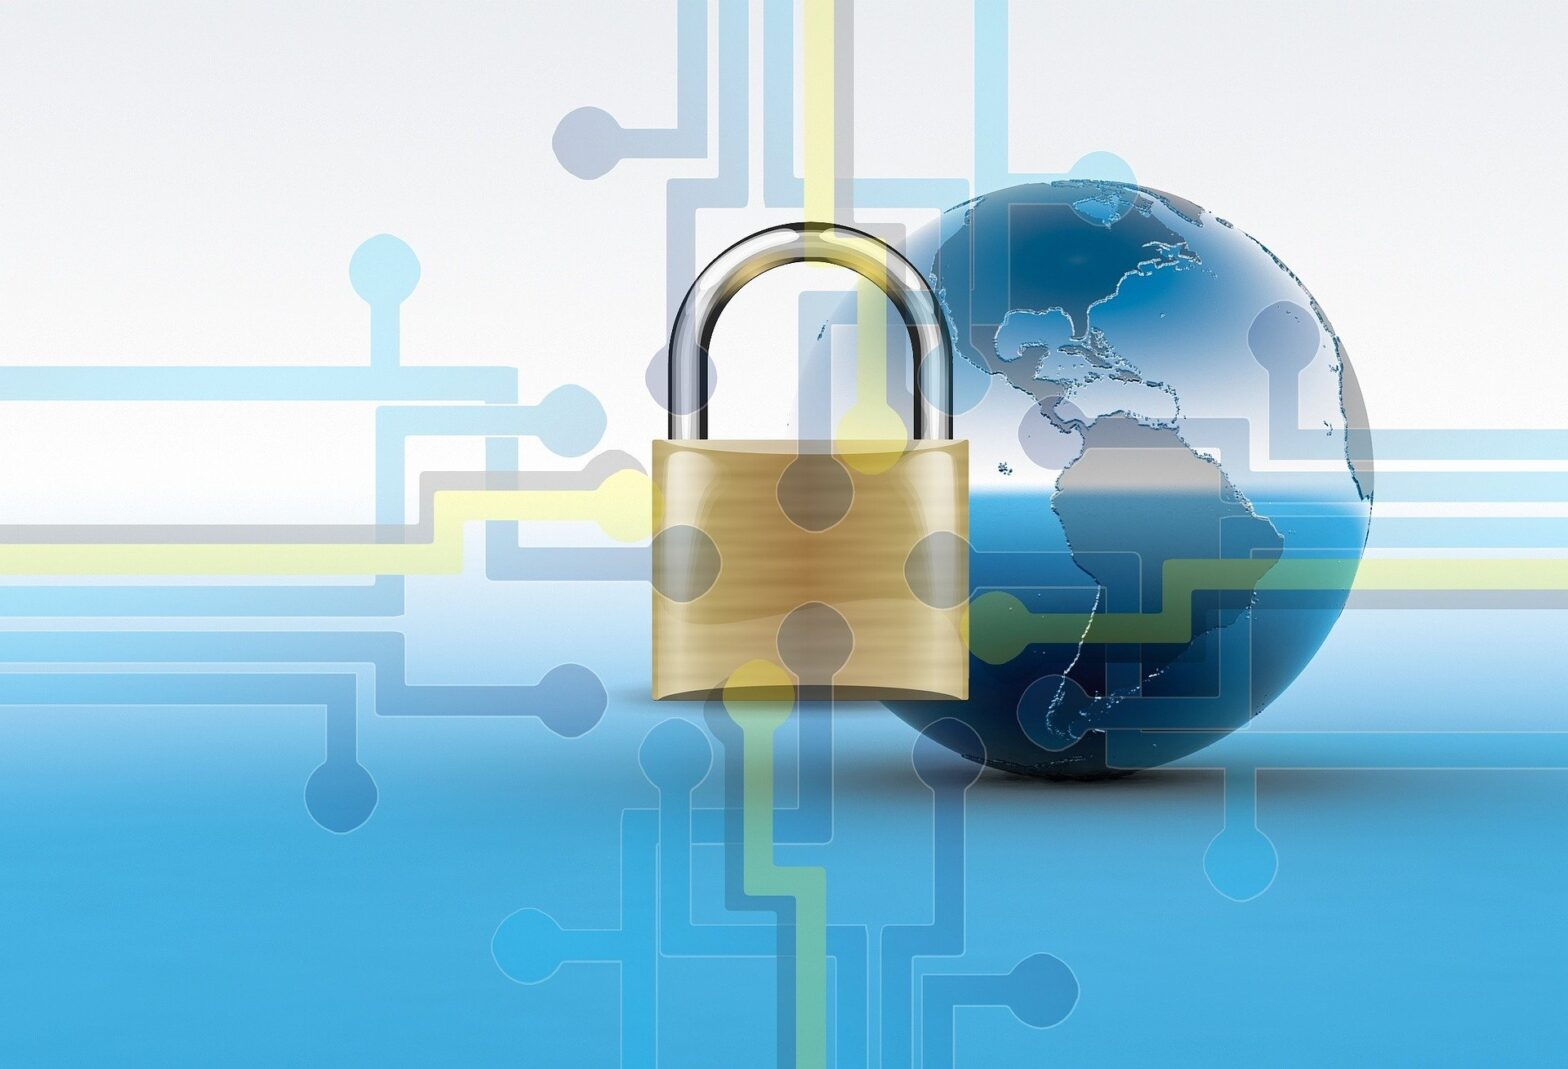 Let's Encrypt SSL in GoDaddy using cPanel